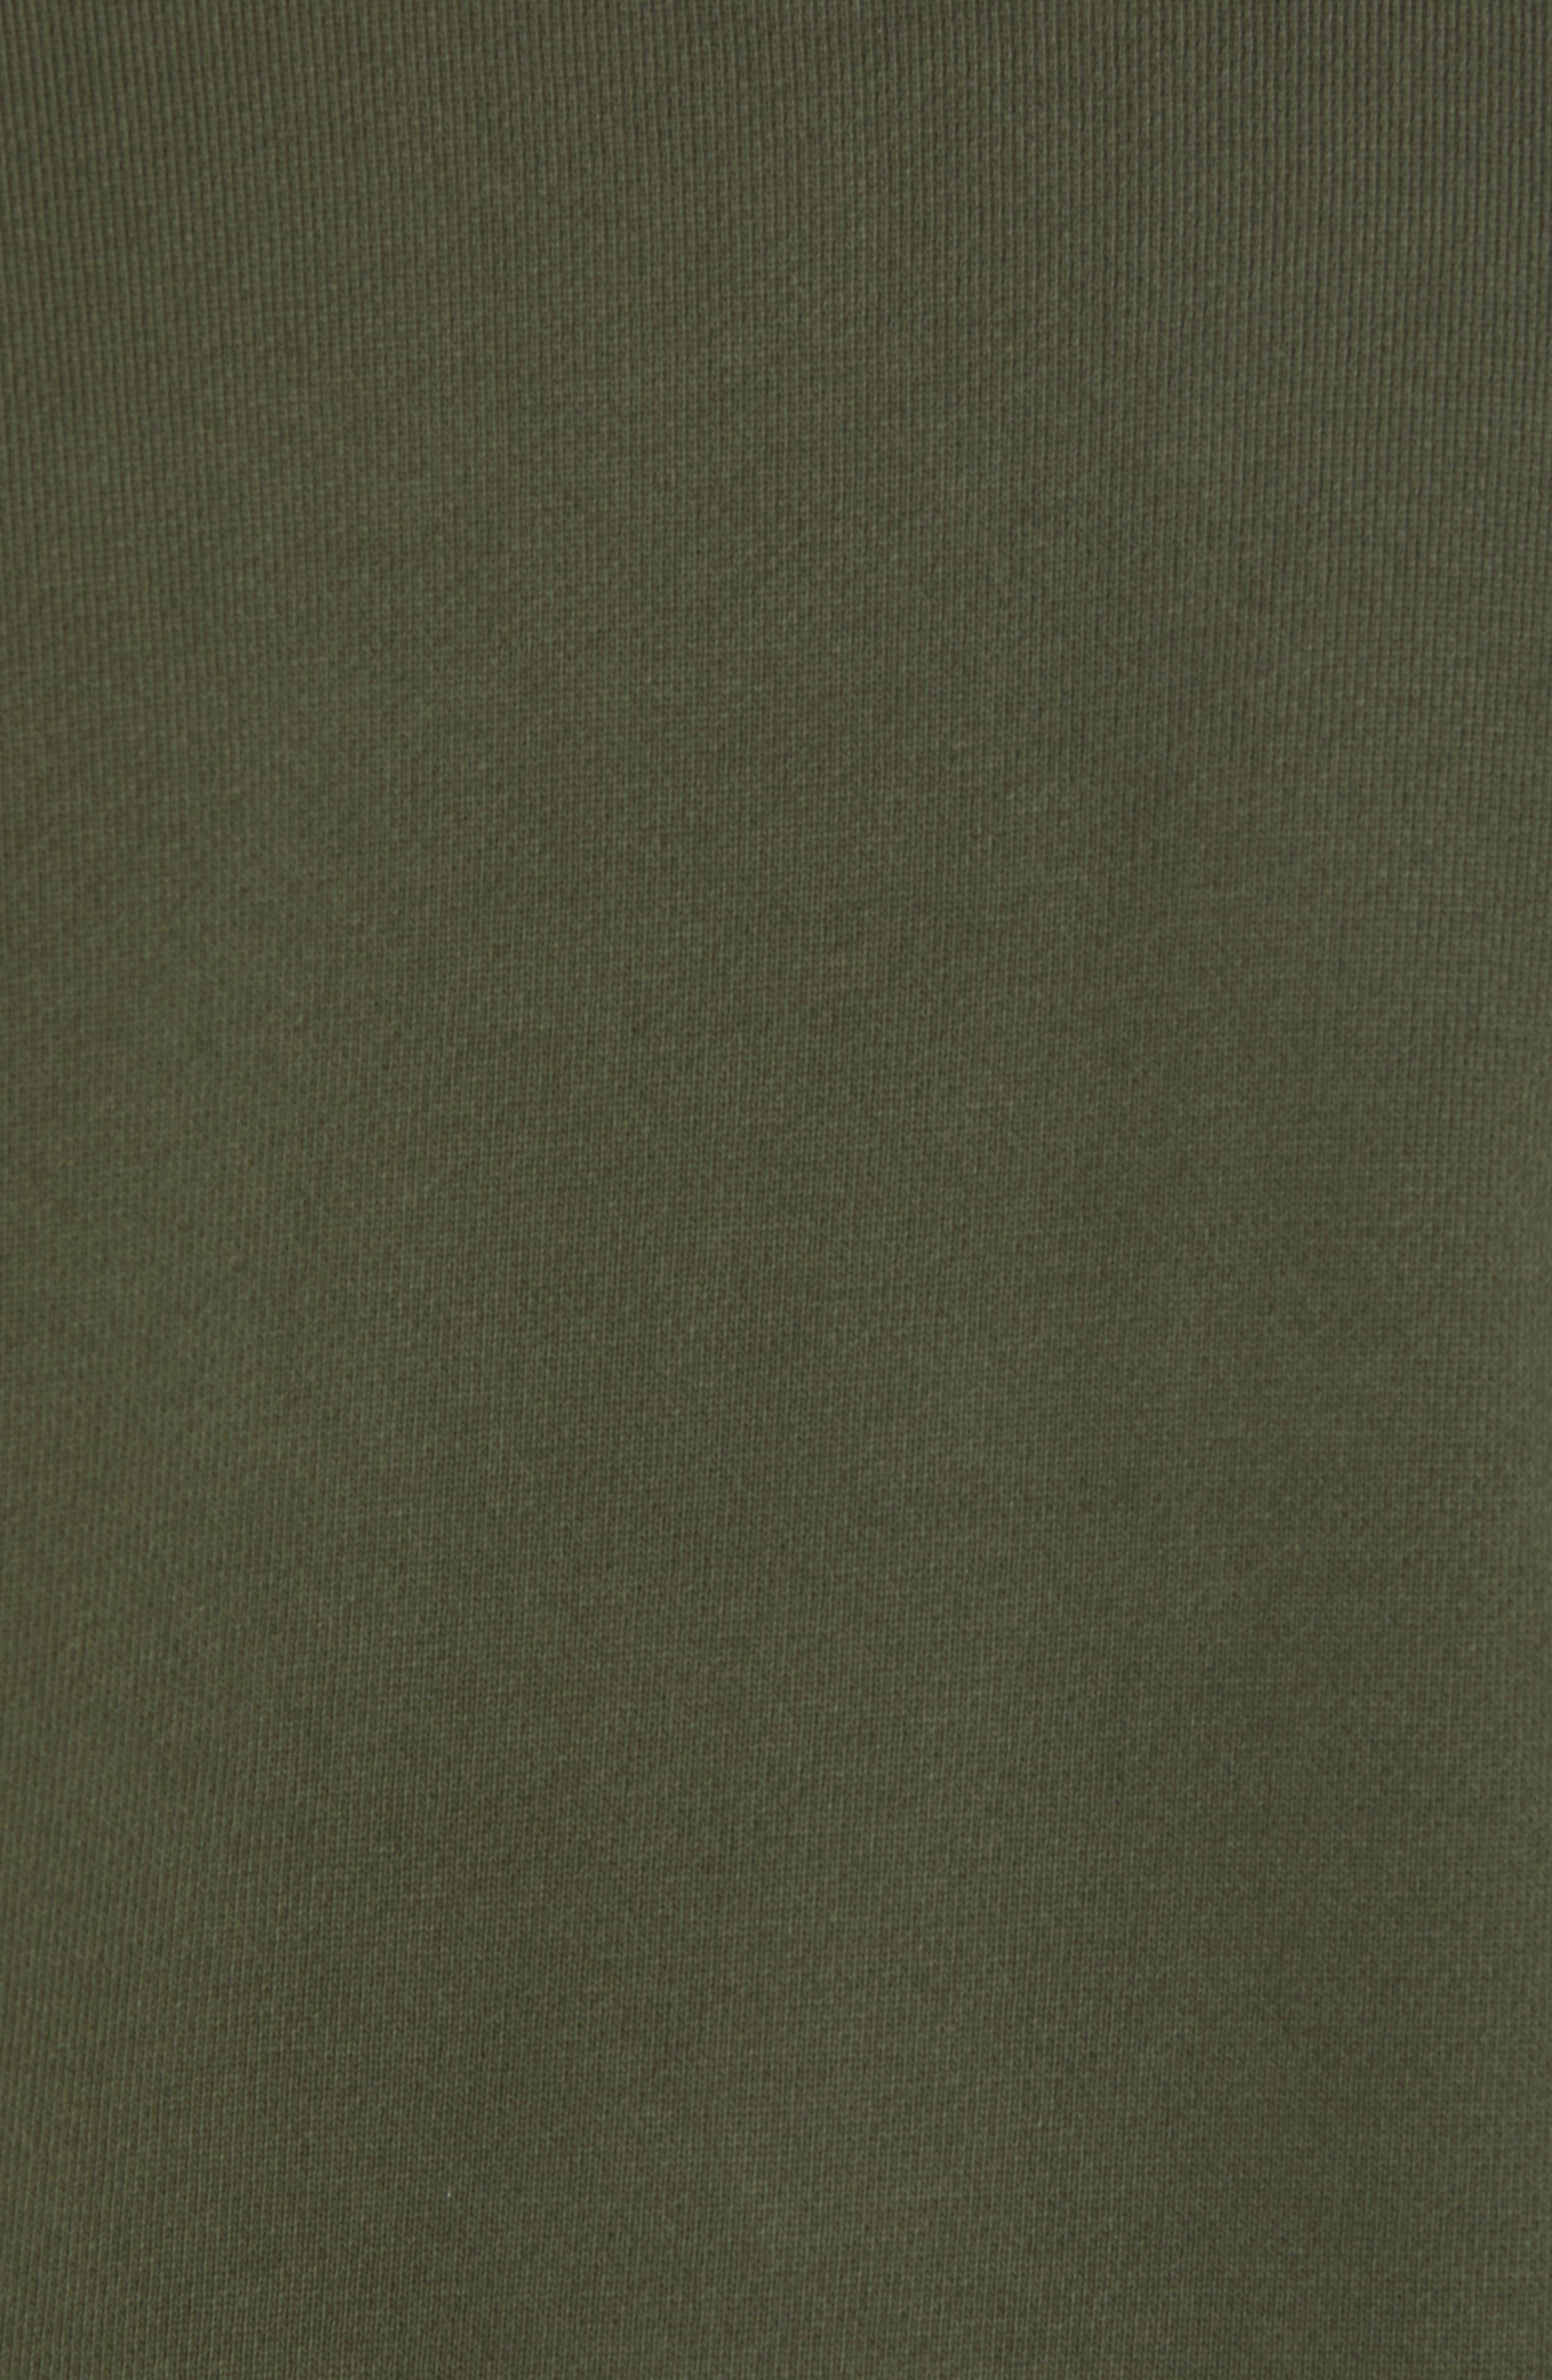 adidas Outline Trefoil Crewneck Sweatshirt,                             Alternate thumbnail 5, color,                             307